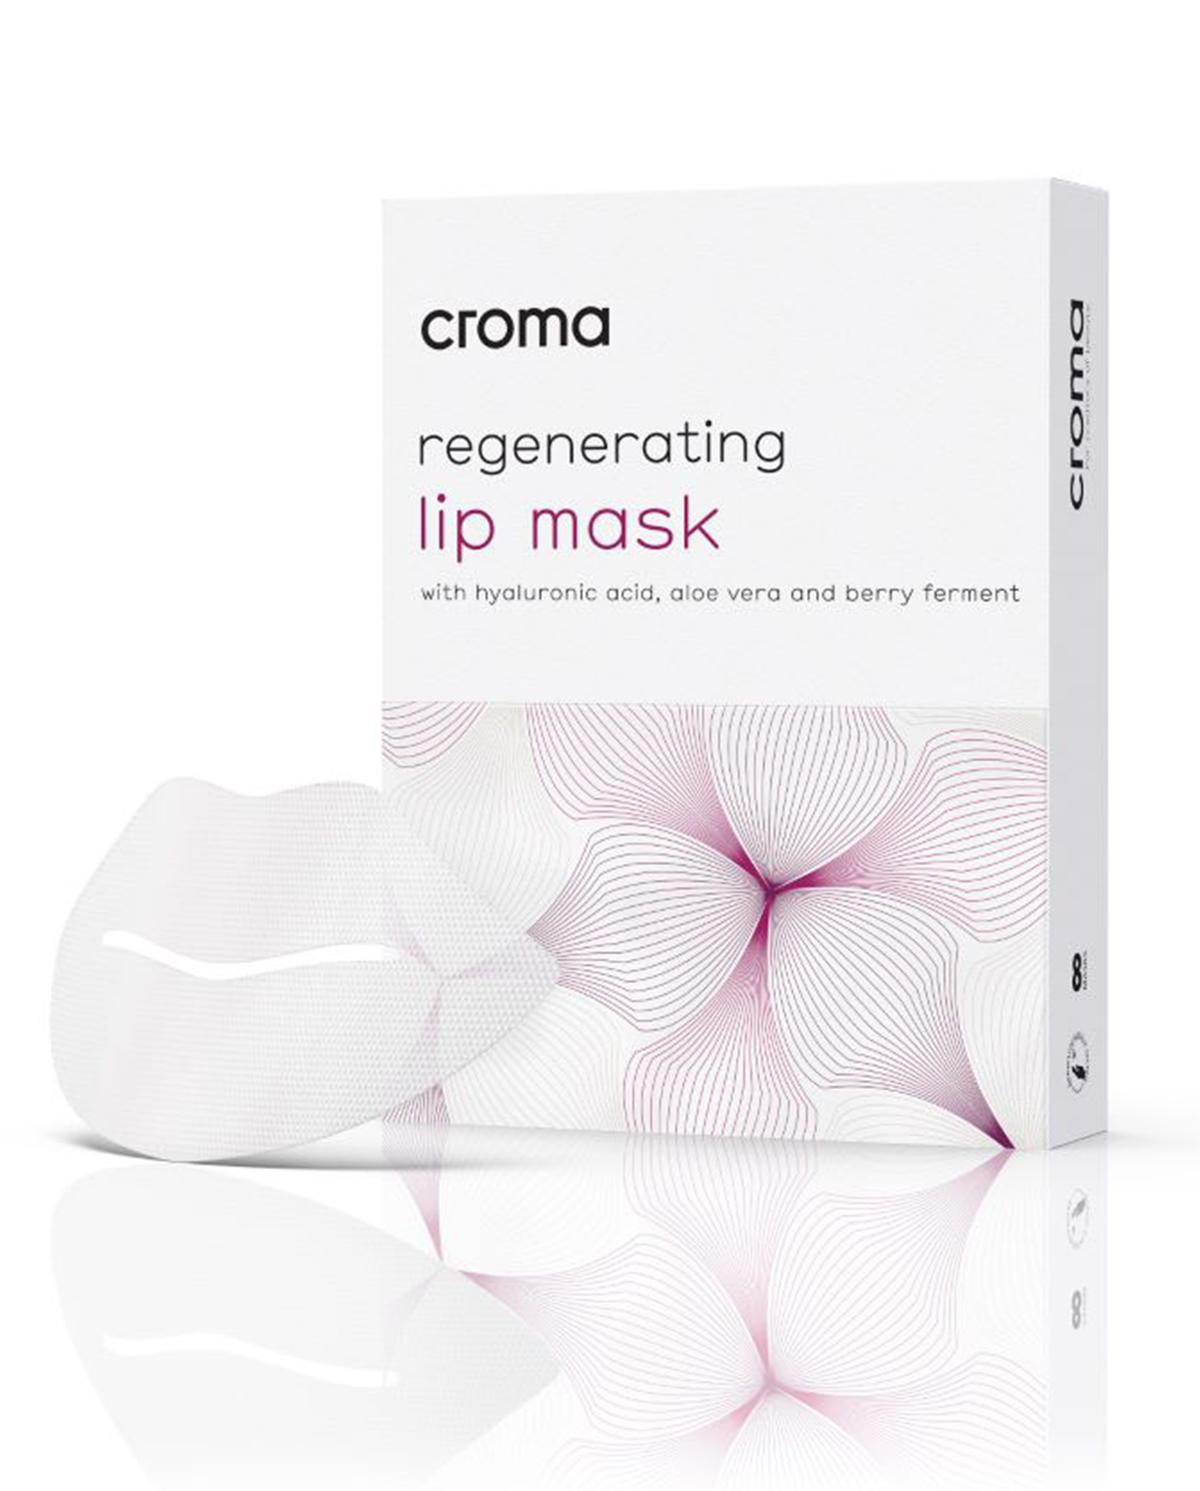 Croma regenerating lip mask sRGB Large 1